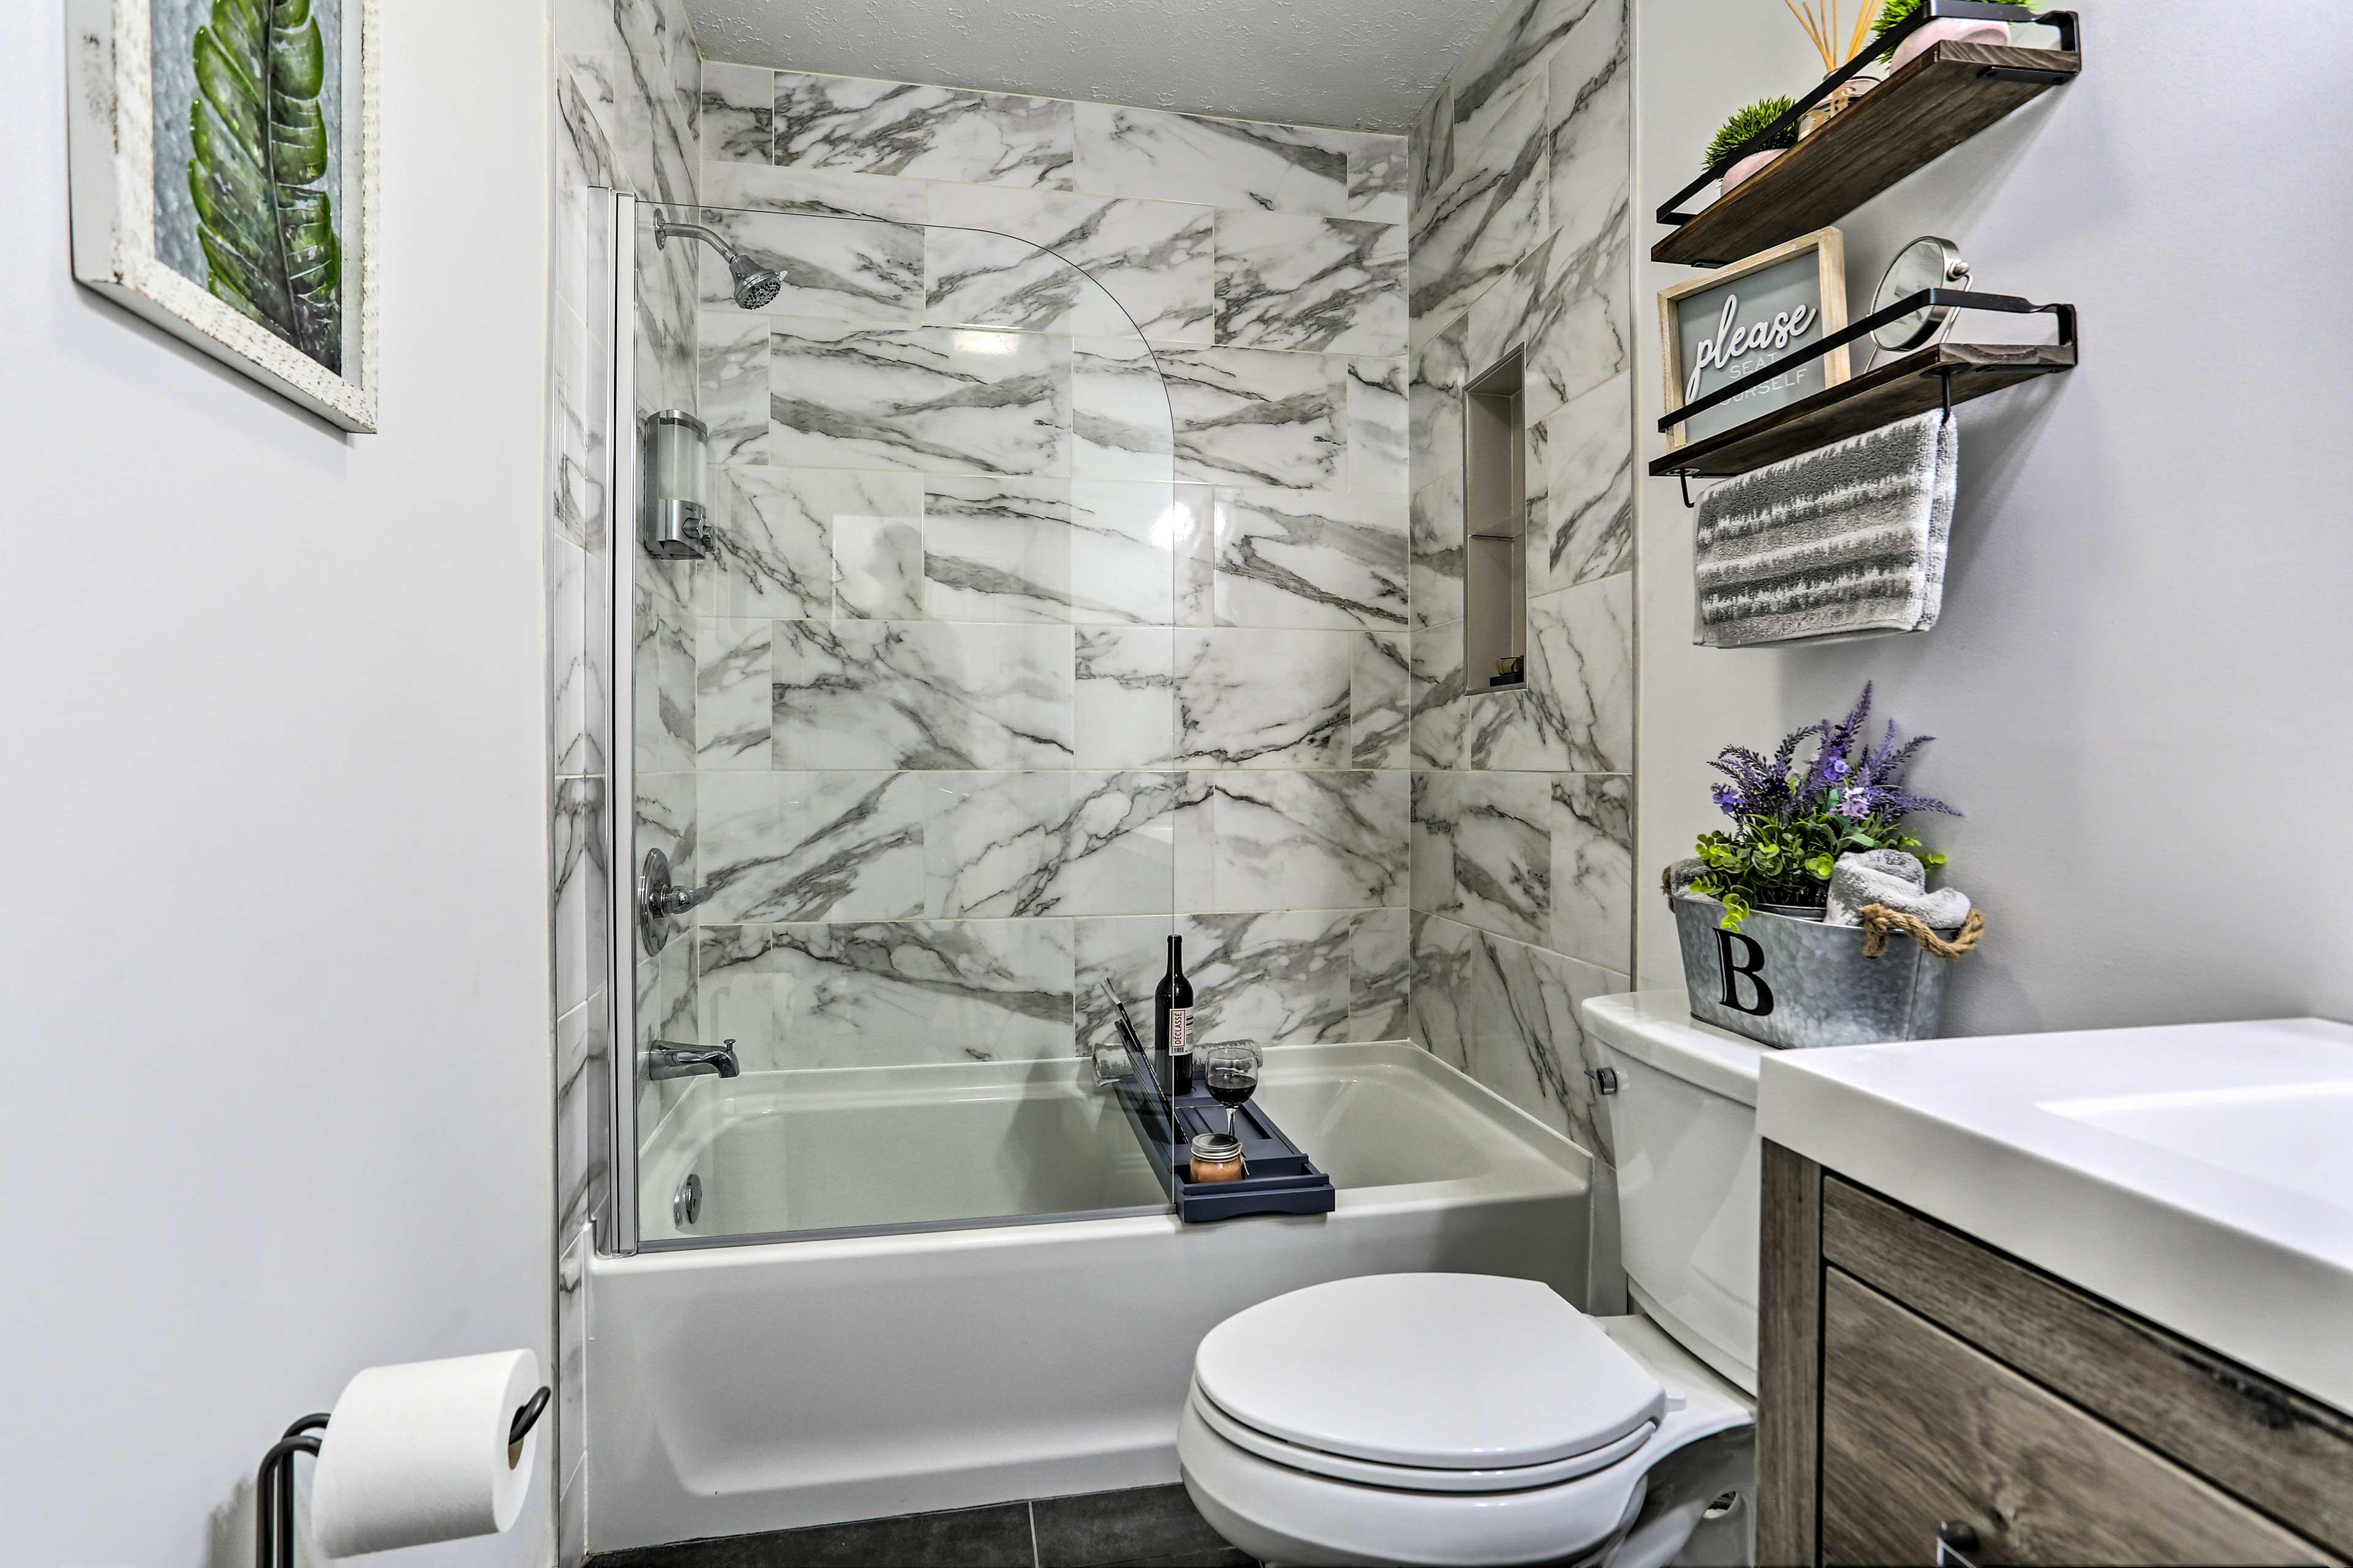 Bathroom | 2nd Floor | Complimentary Toiletries | No Grab Rails in Shower